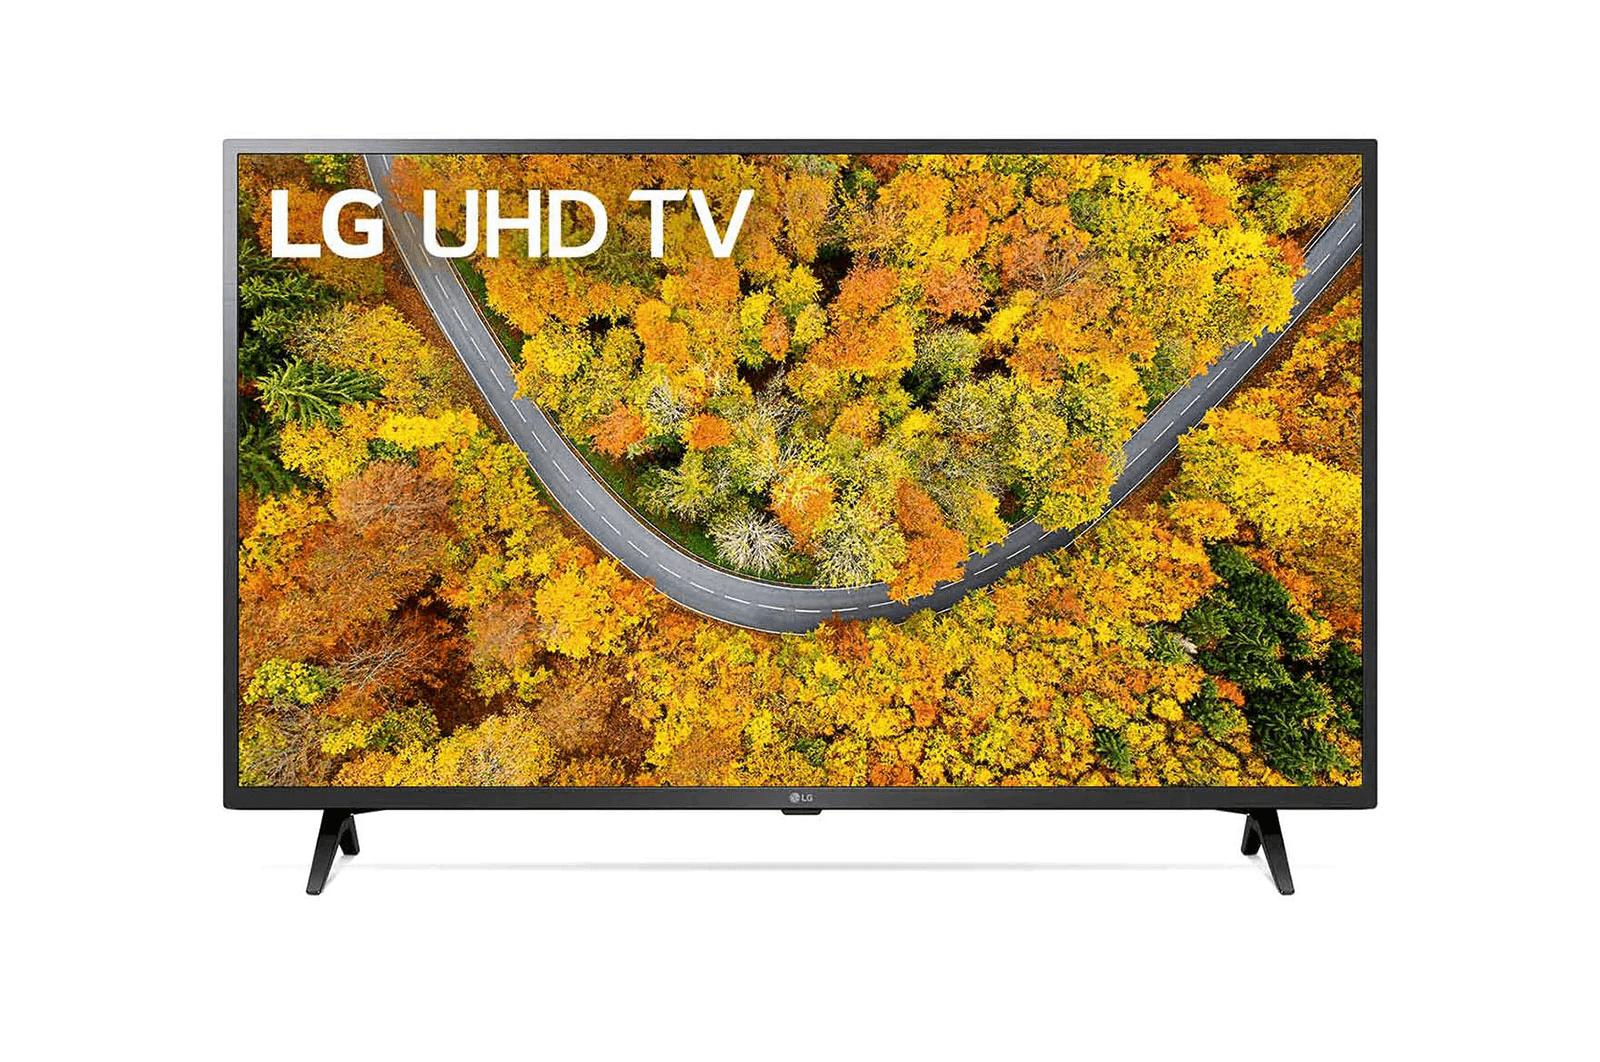 LG - LED TV 43UP7500PTC